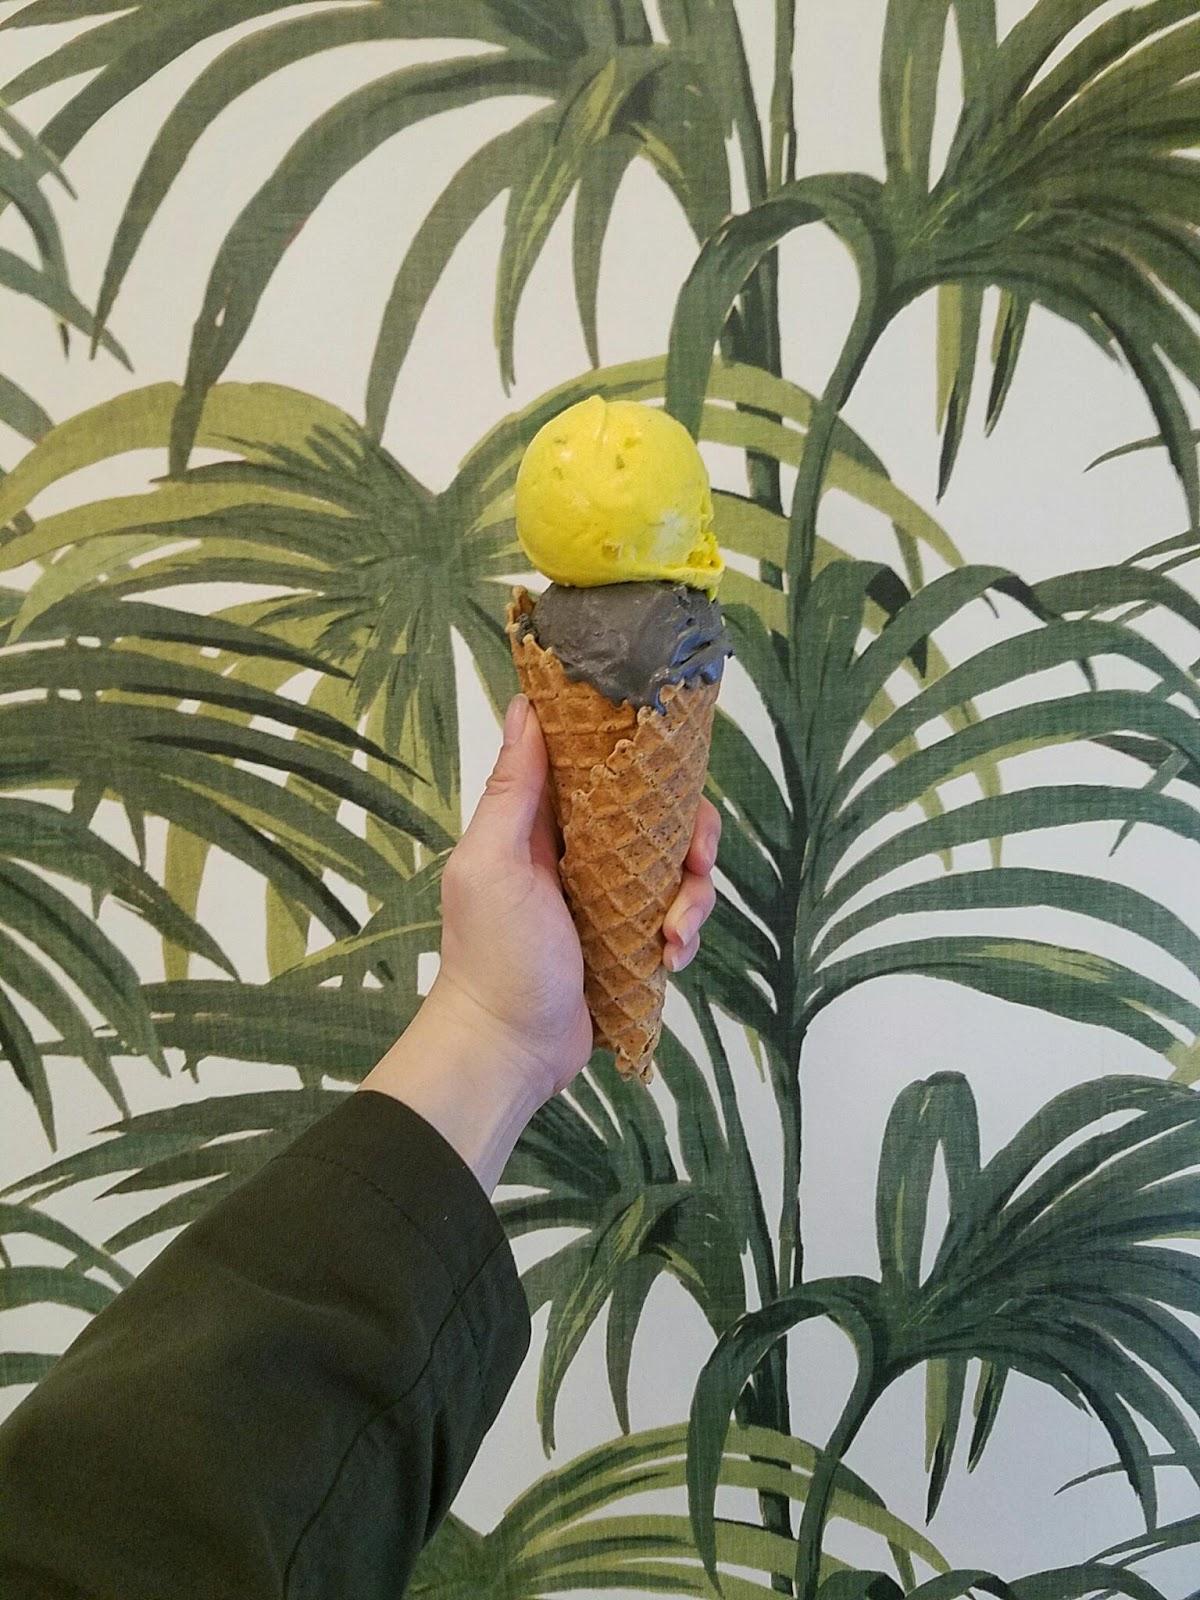 capitol hill seattle ice cream vegan plant based vegetarian